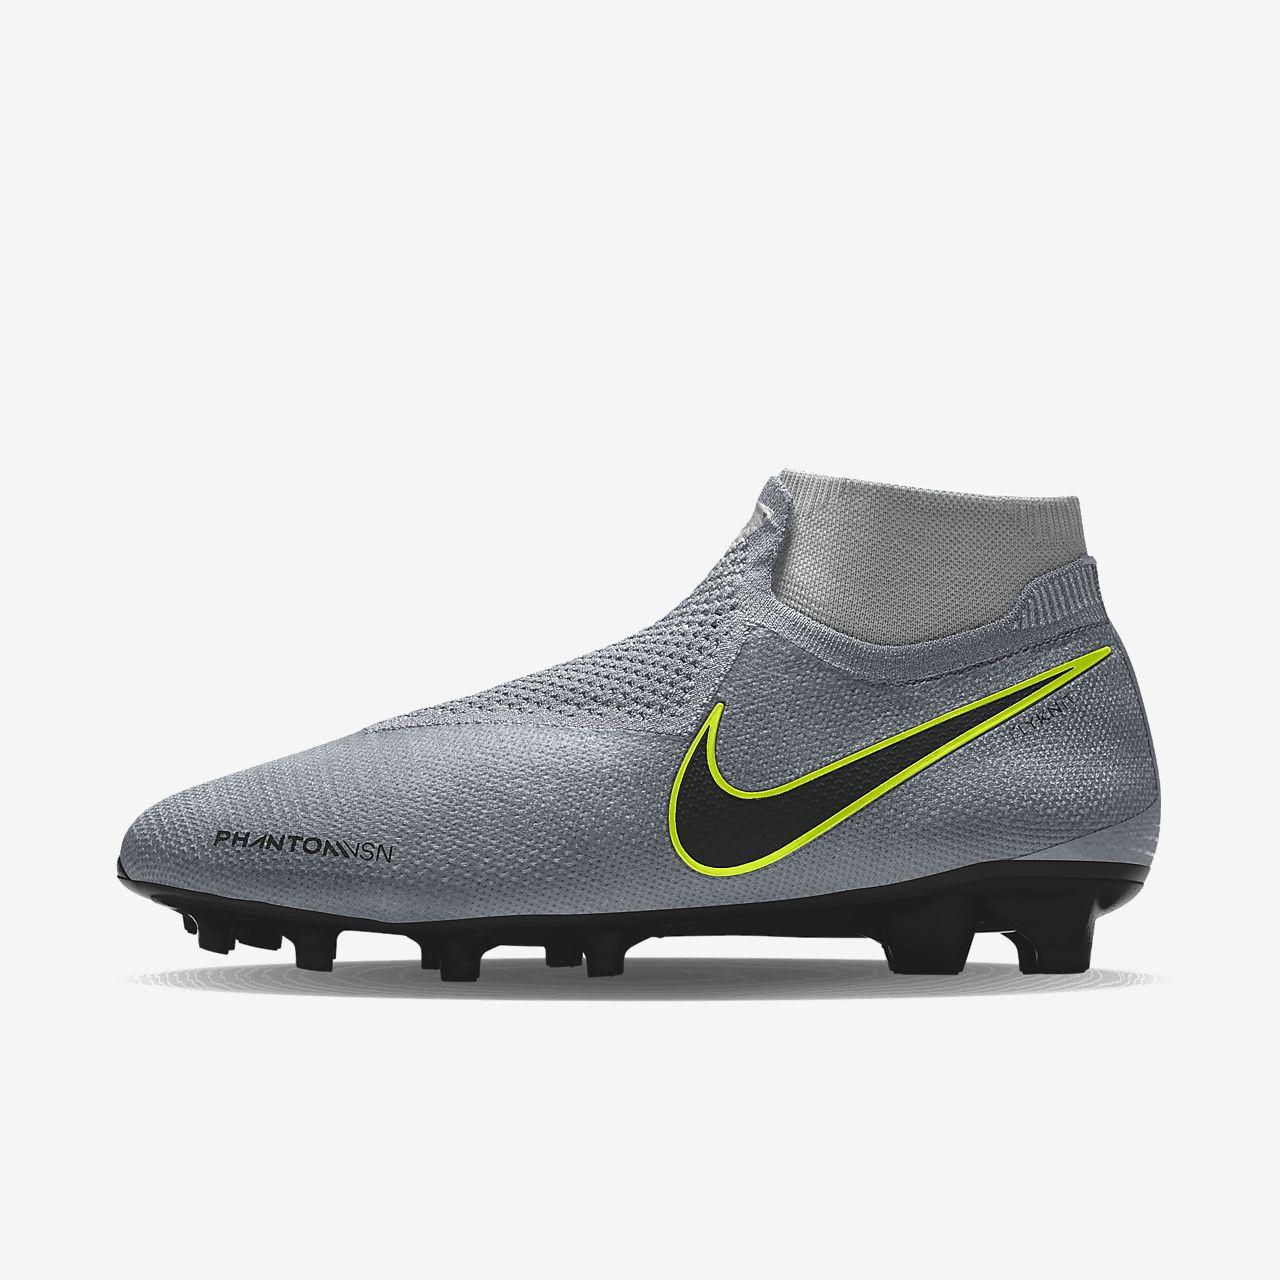 Nike Phantom Vision Elite FG By You 專屬訂製天然偏硬草地英式足球釘鞋